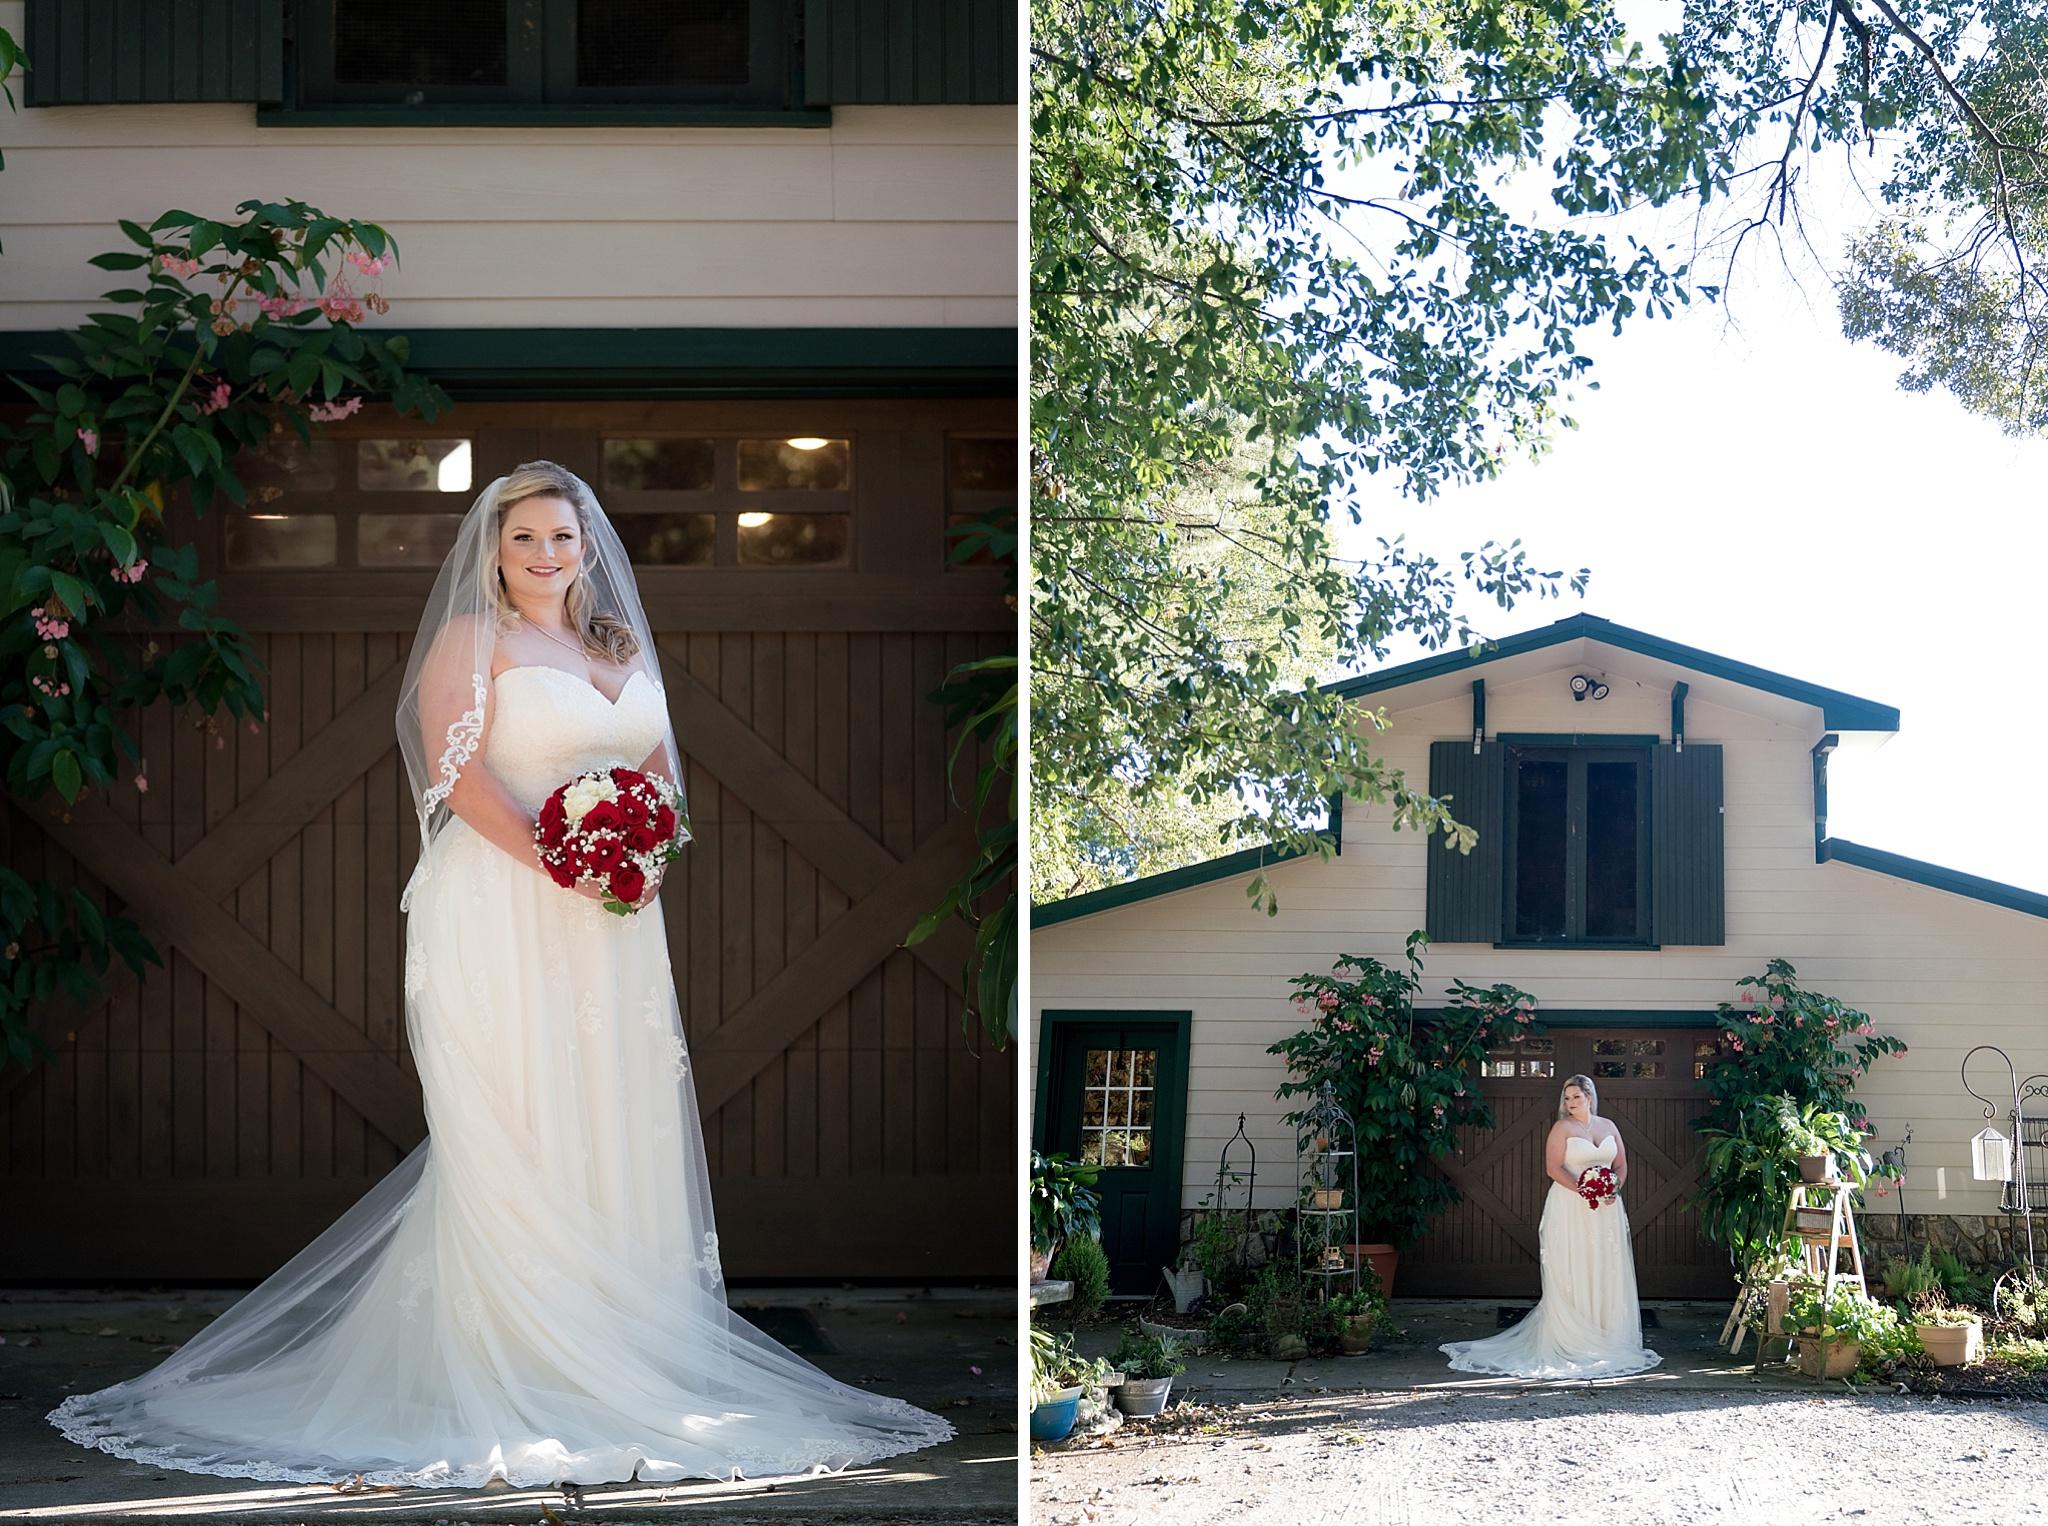 Little-Herb-House-Wedding-Photographer-063.jpg